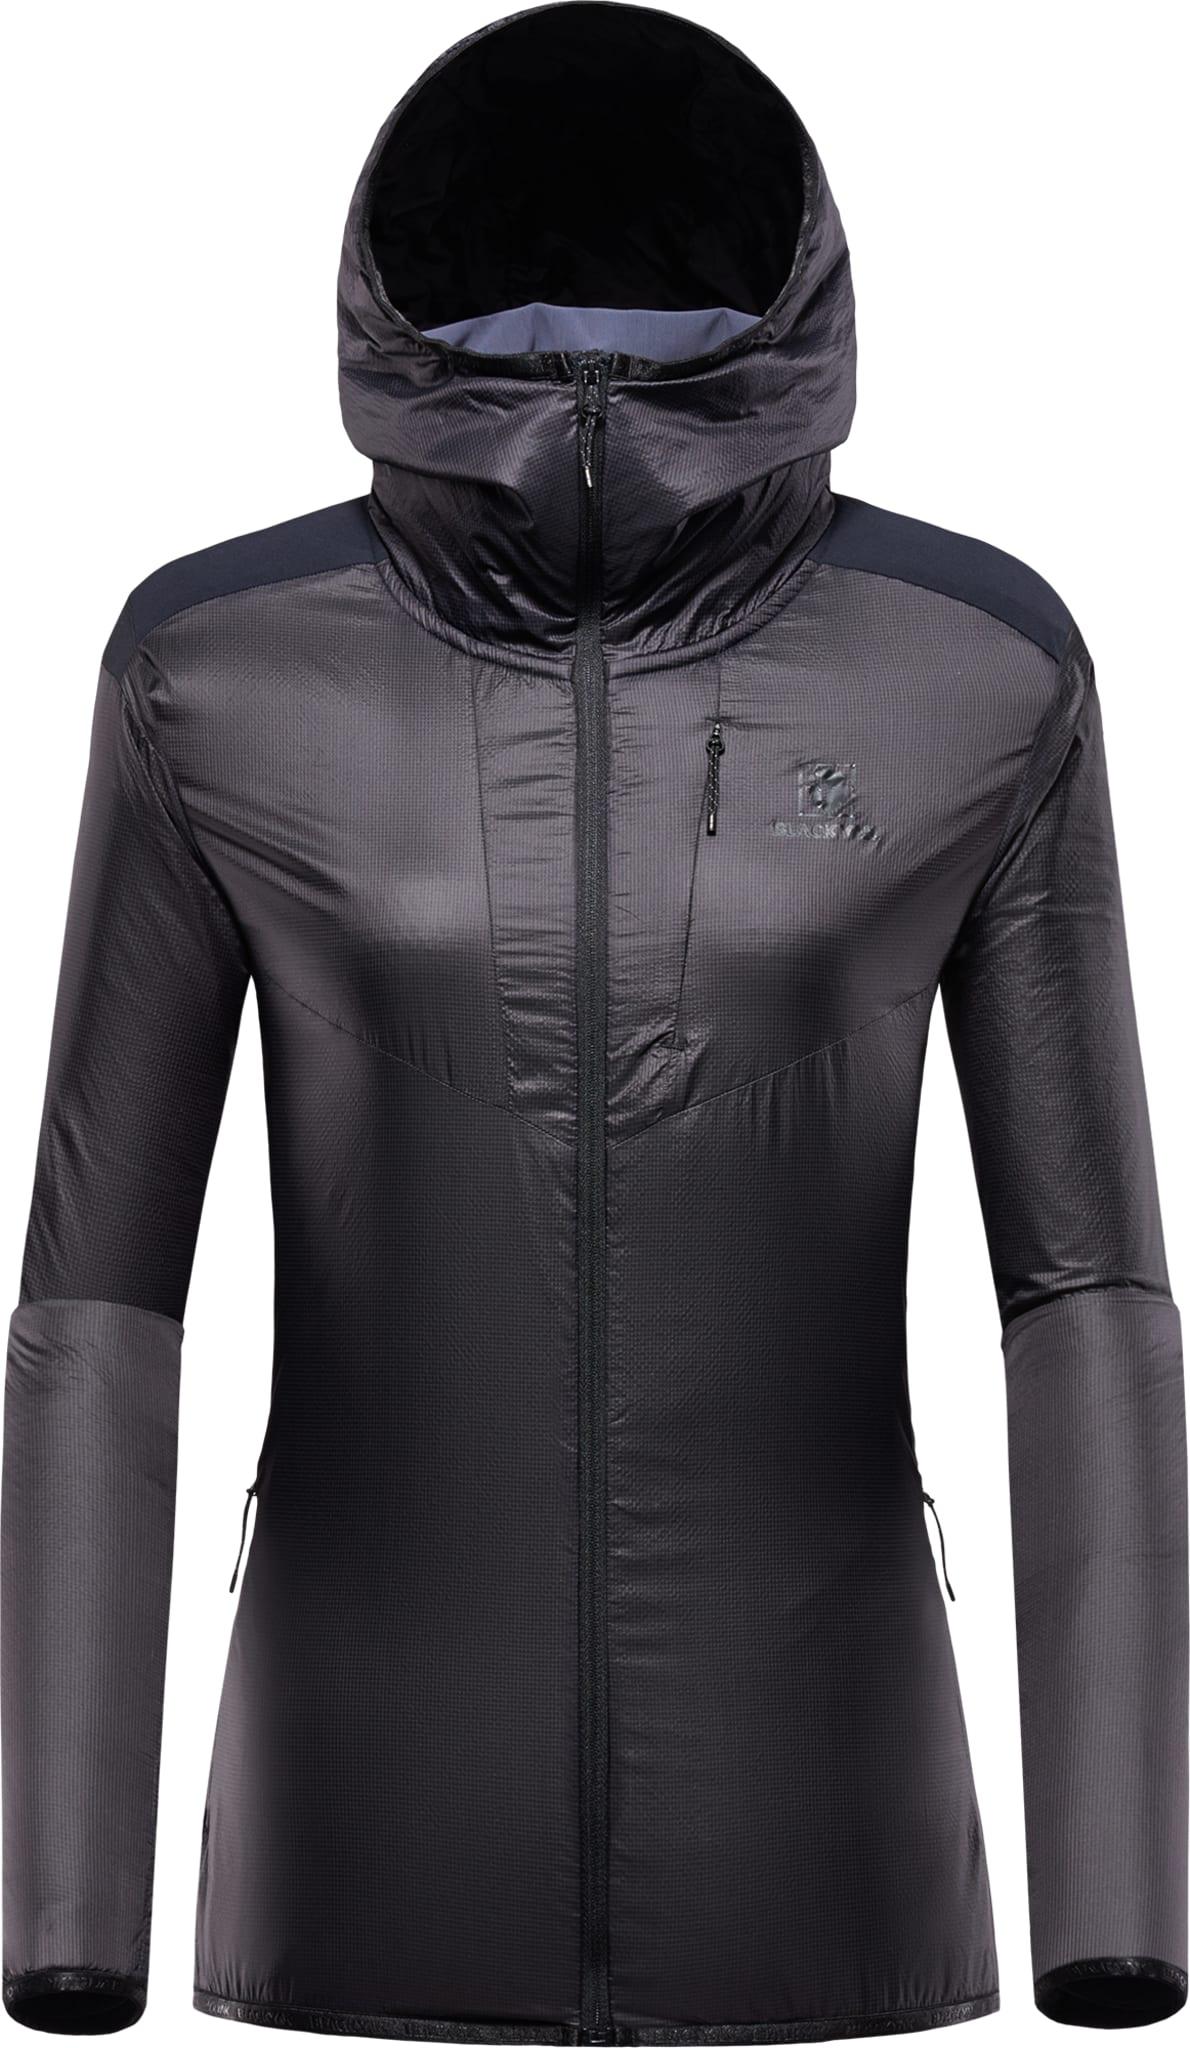 Bargur Jacket Ws